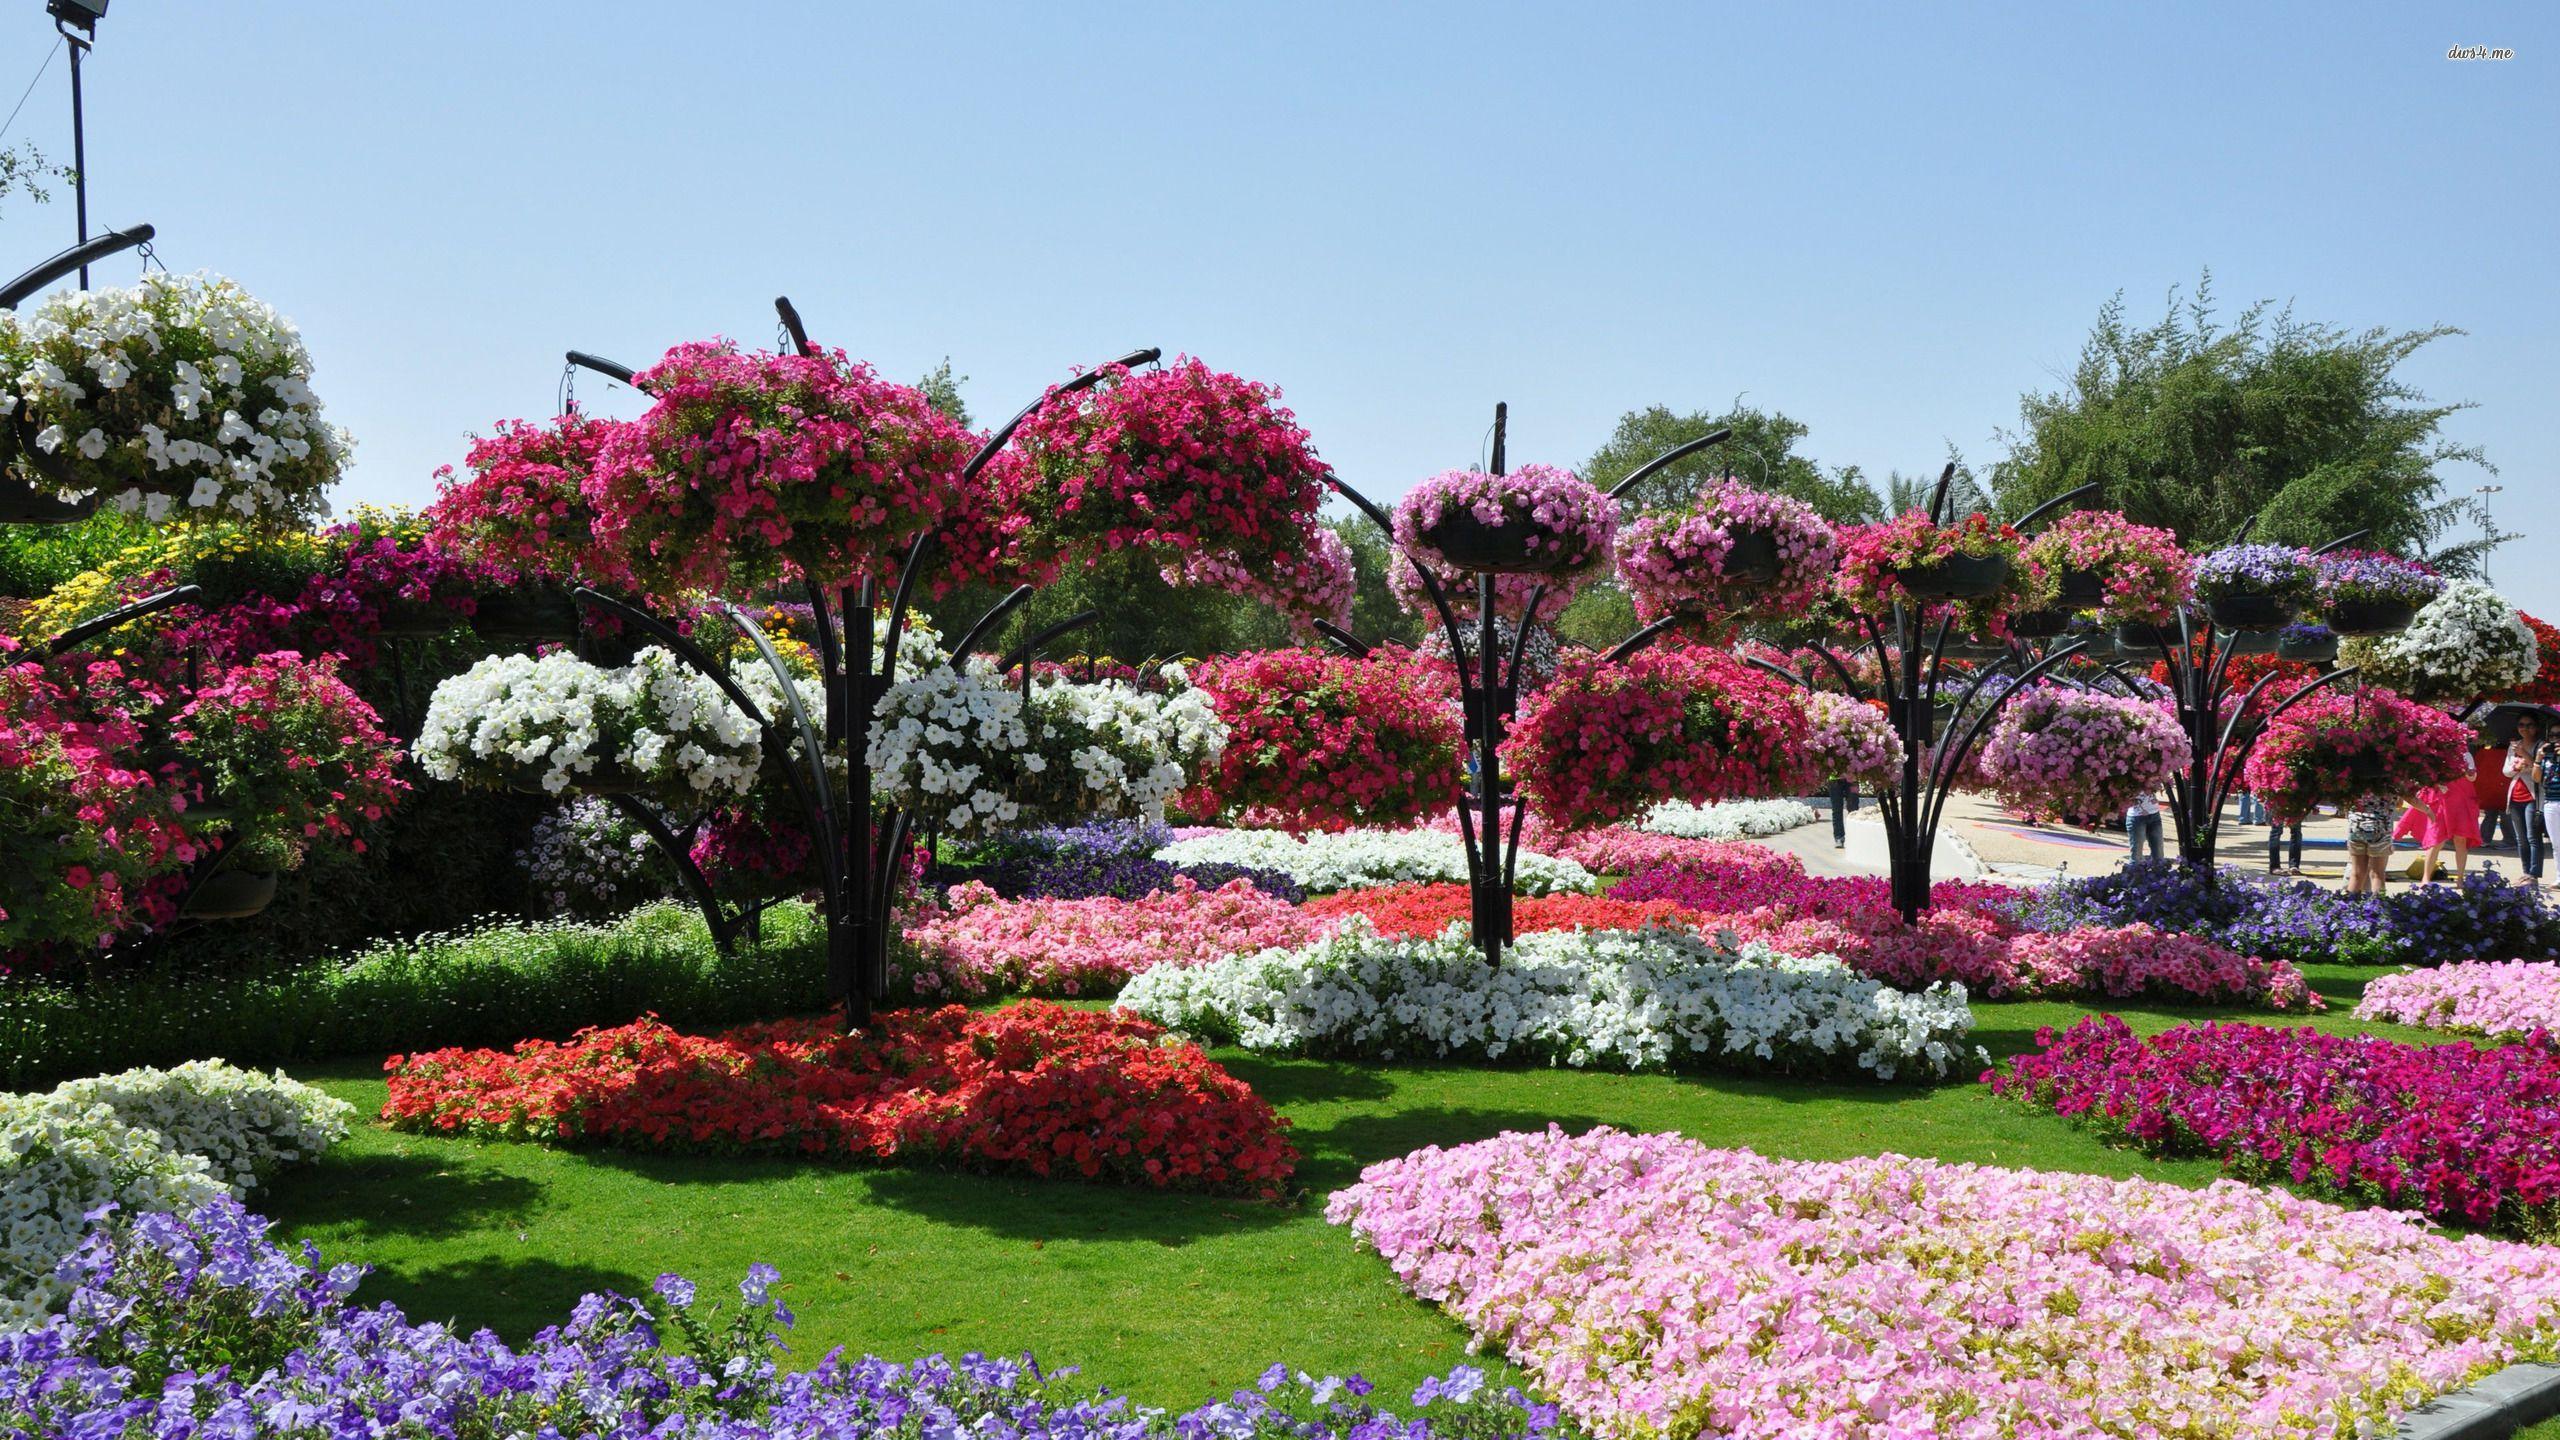 1600x1200 Flower Garden Wallpaper Free Download Refreshrose Blogspot Com